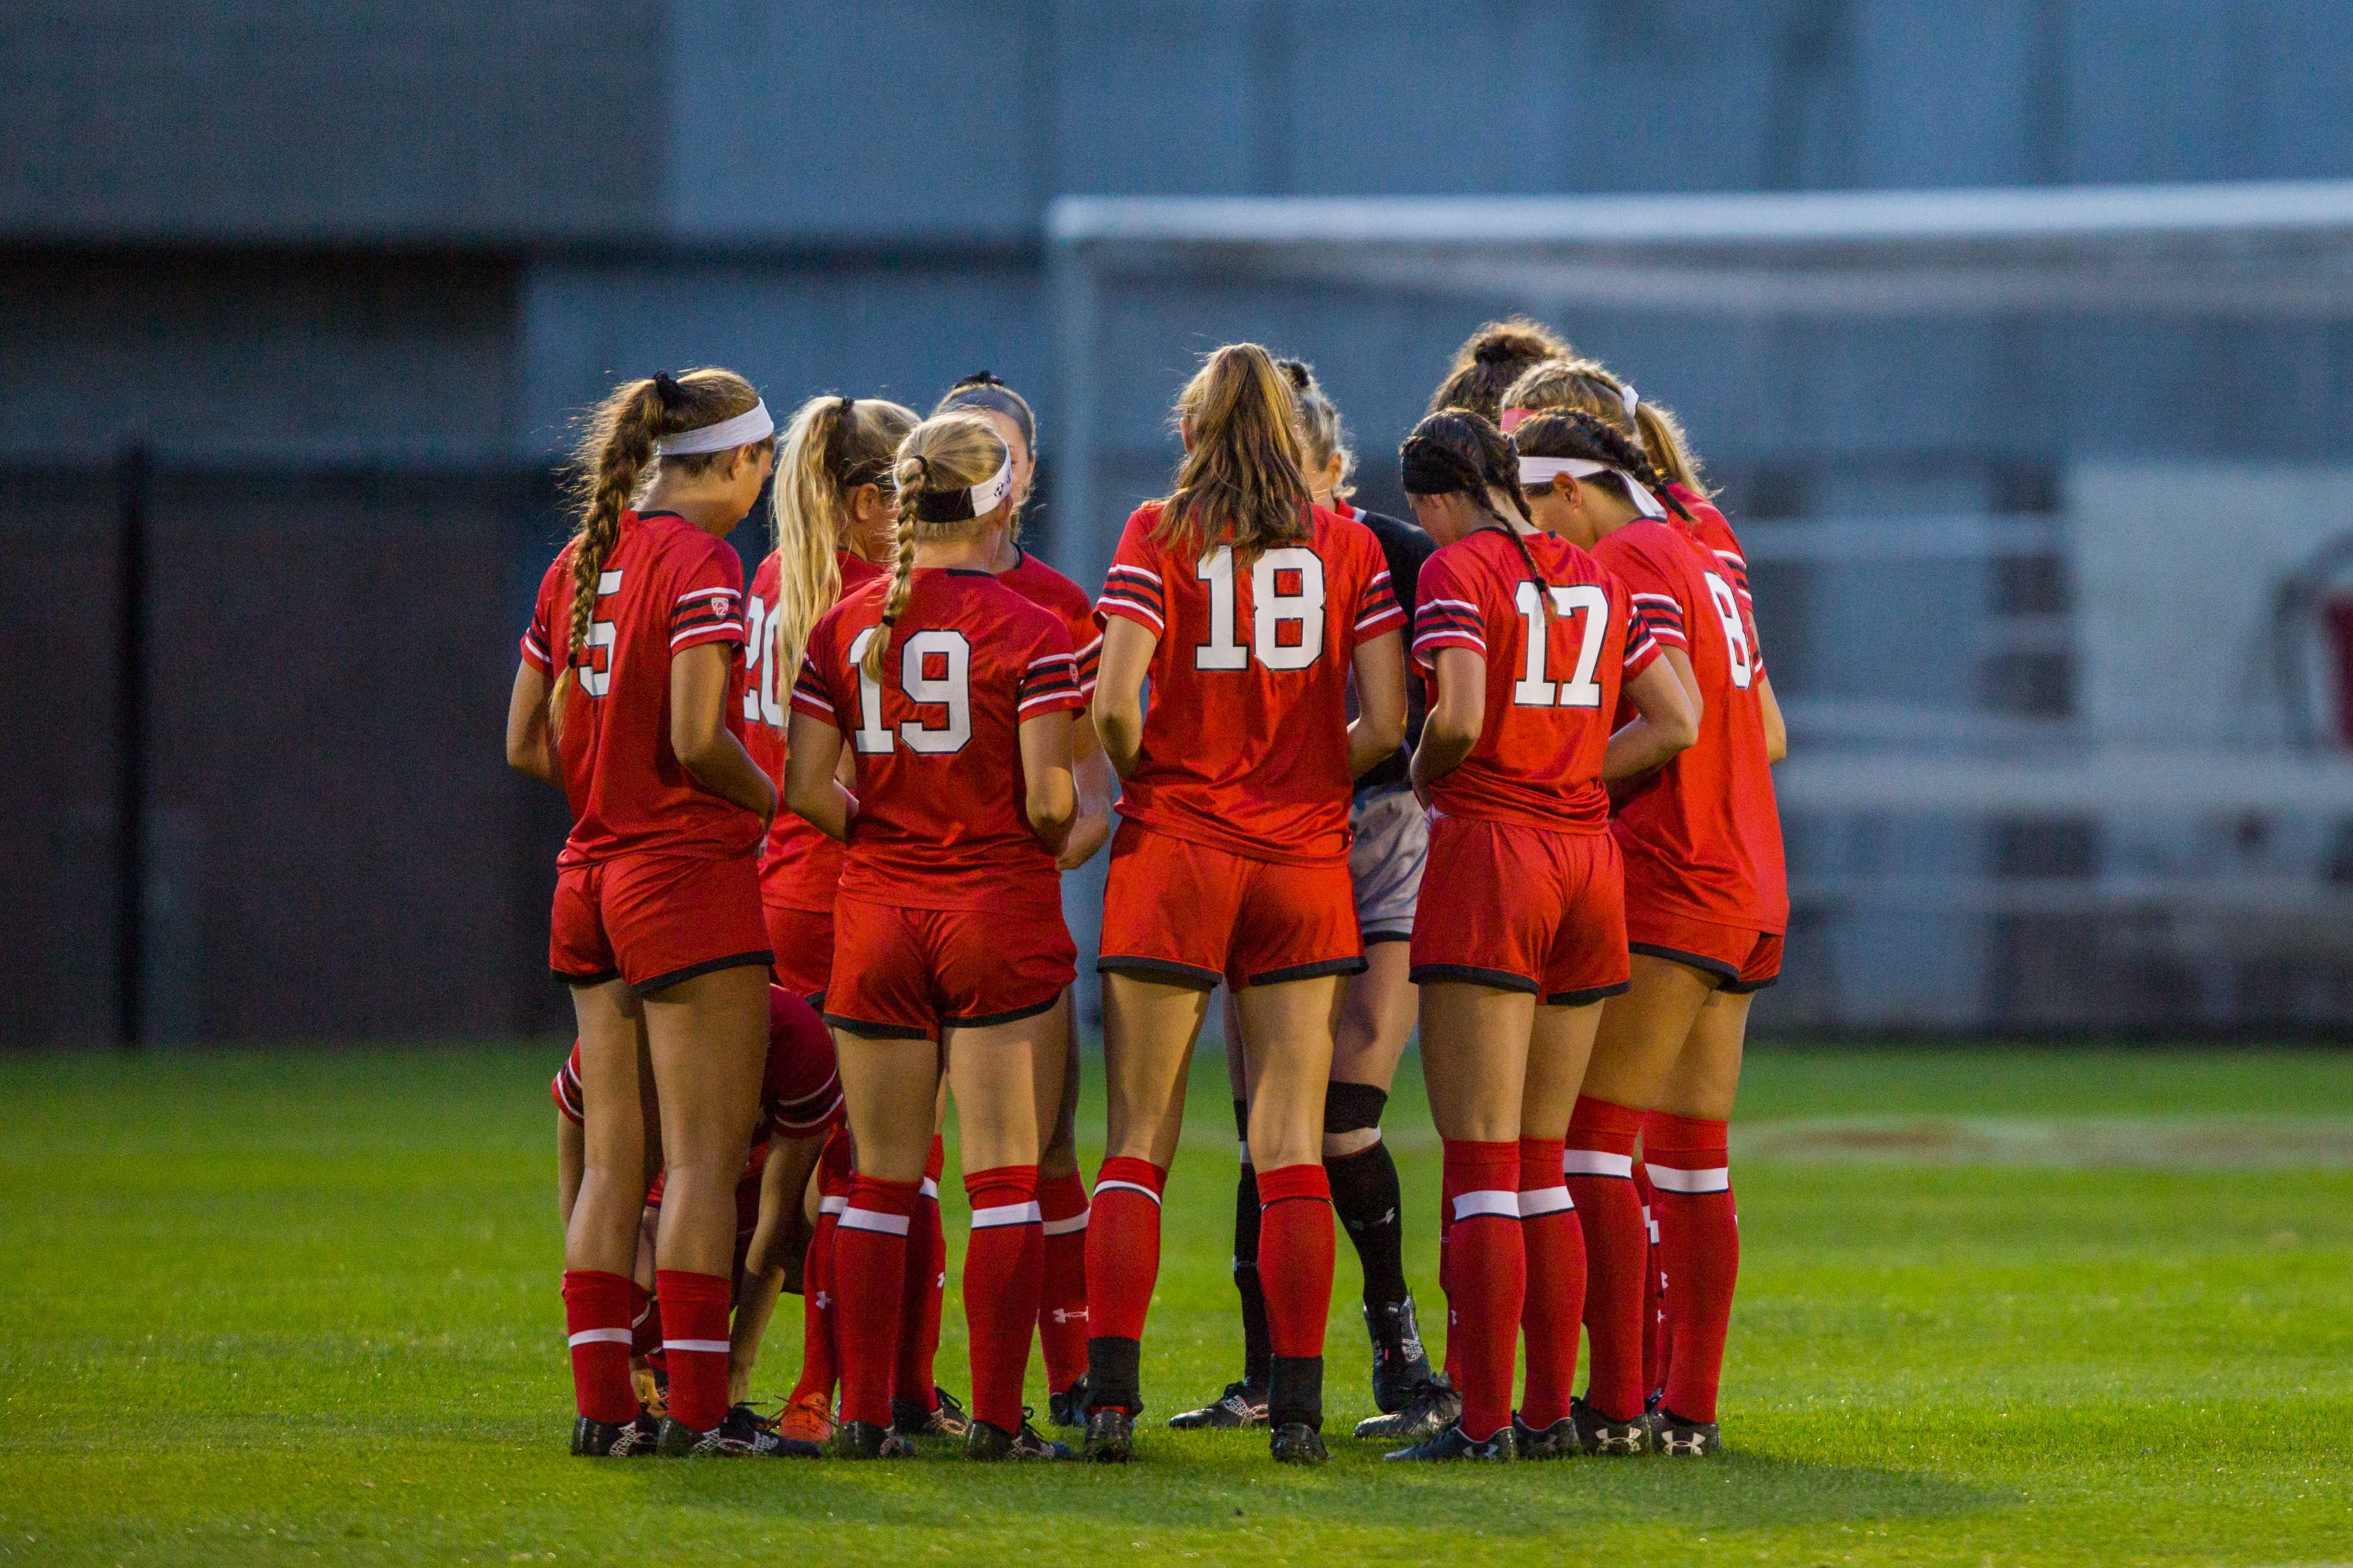 The University of Utah Women's Soccer team huddle up prior to the start in an NCAA Women's Soccer game vs. Washington at Ute Soccer Field in Salt Lake City, UT on Thursday October 04, 2018.  (Photo by Curtis Lin | Daily Utah Chronicle)